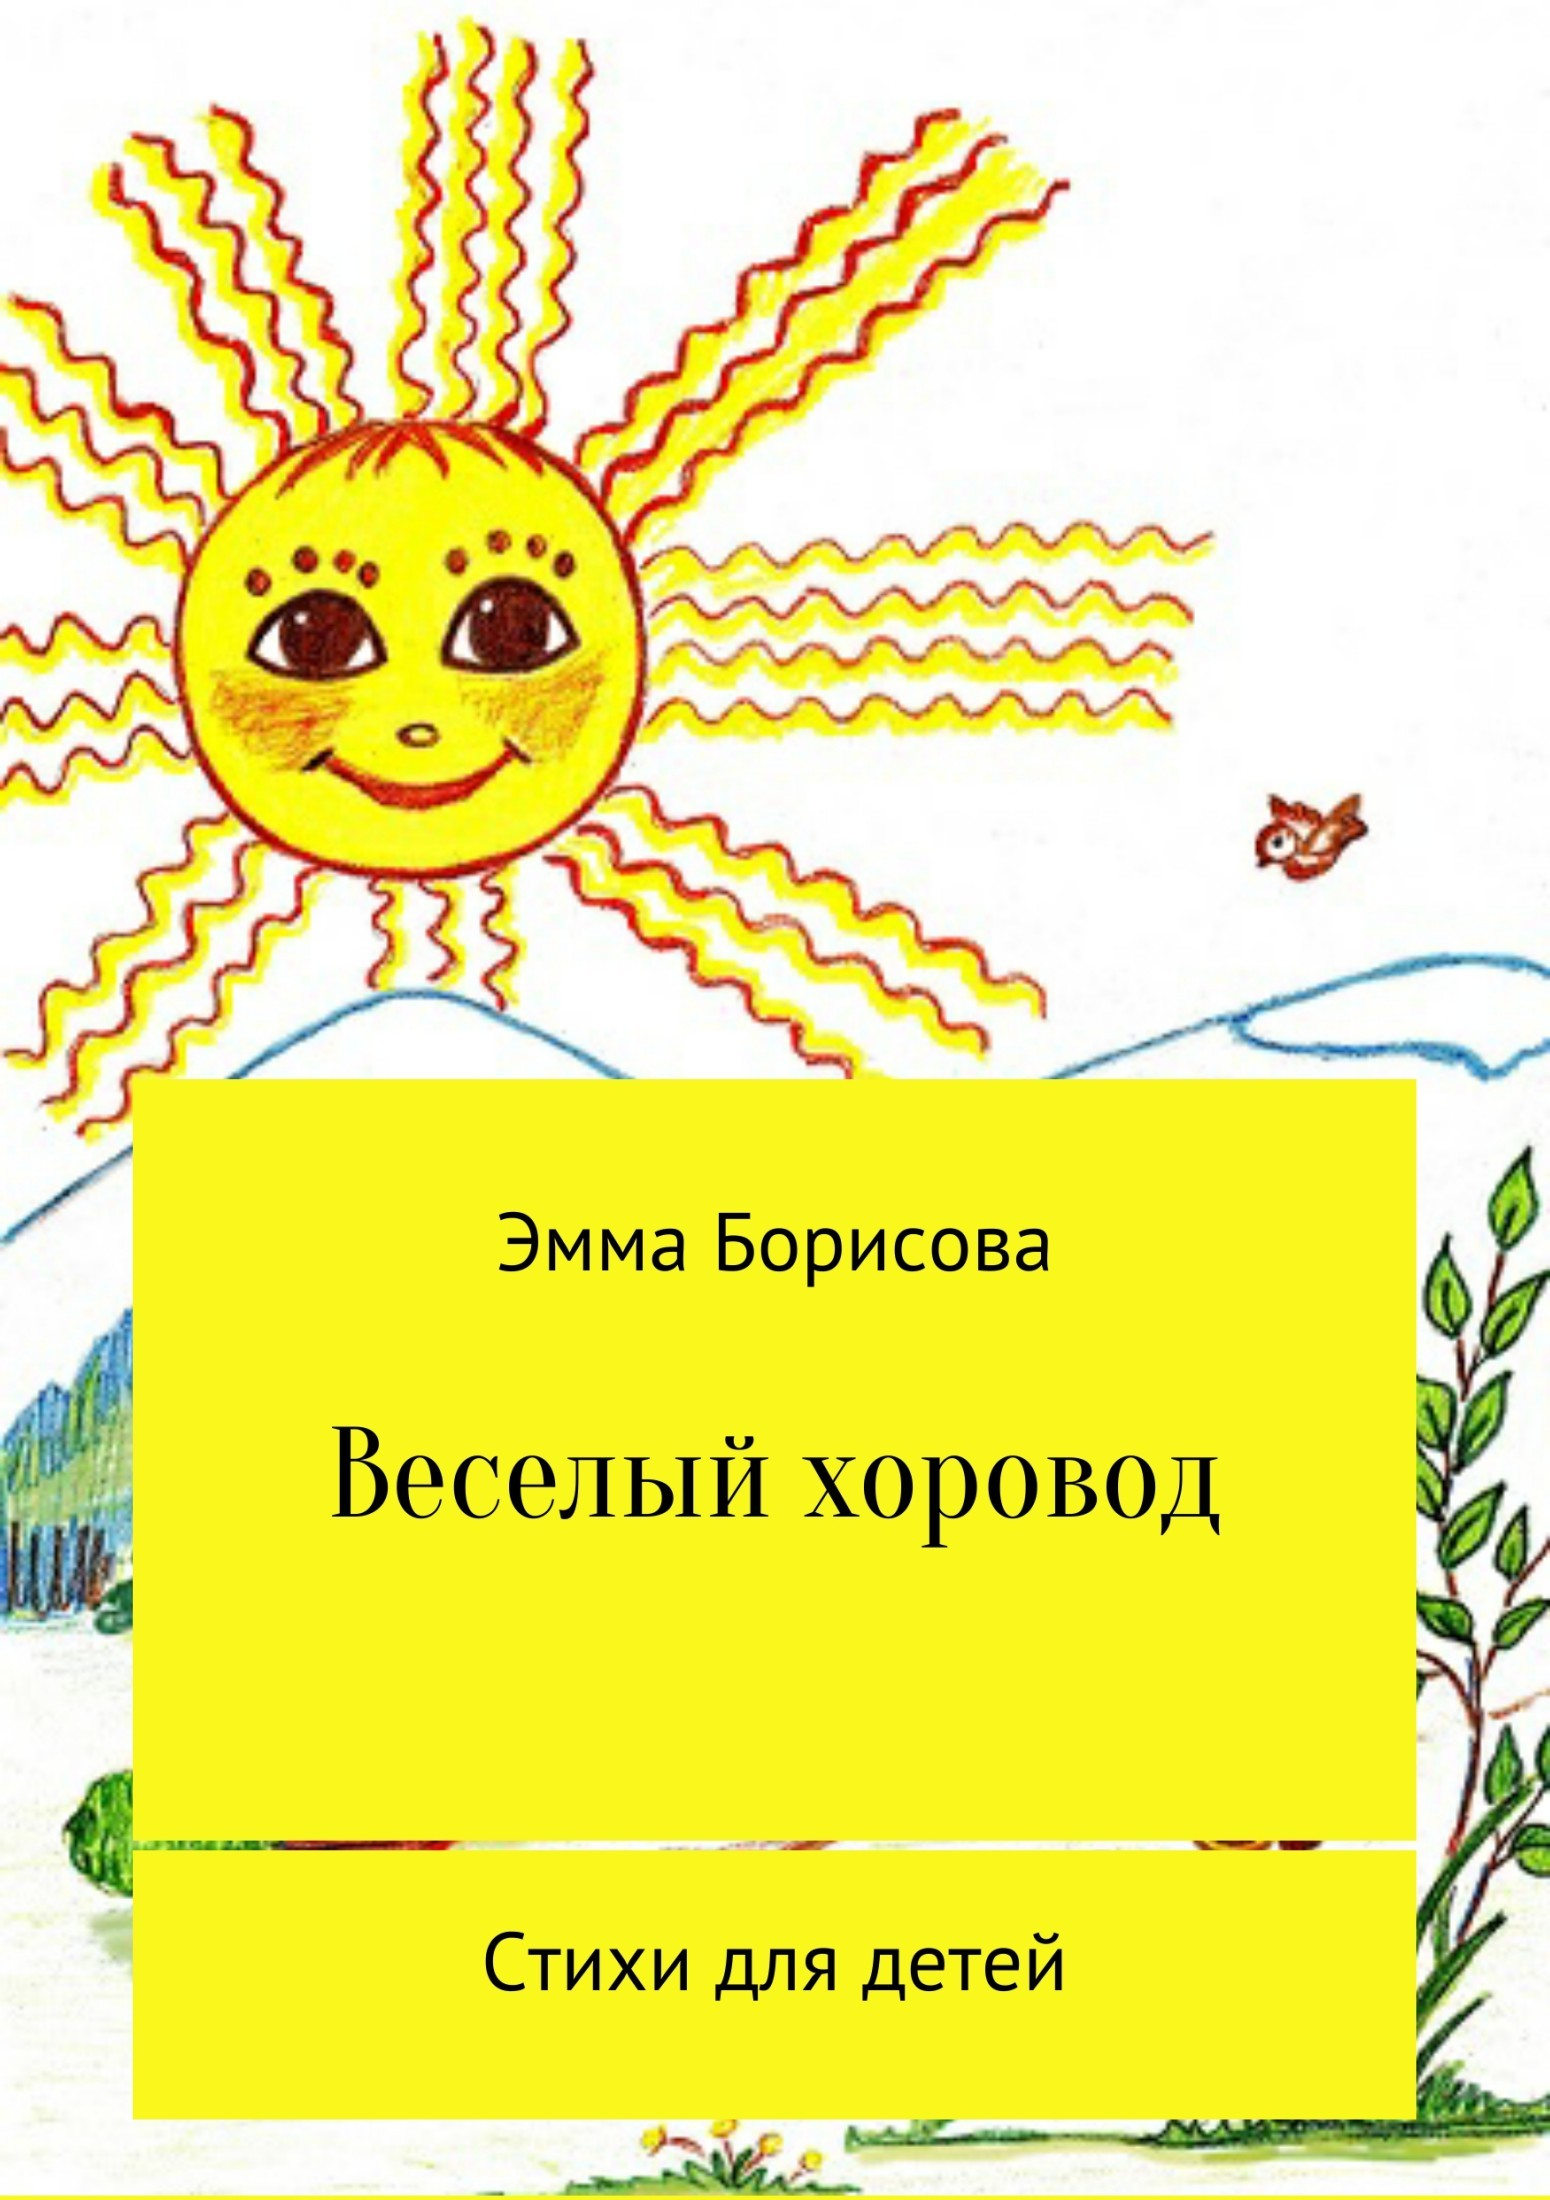 Эмма Борисова. Веселый хоровод